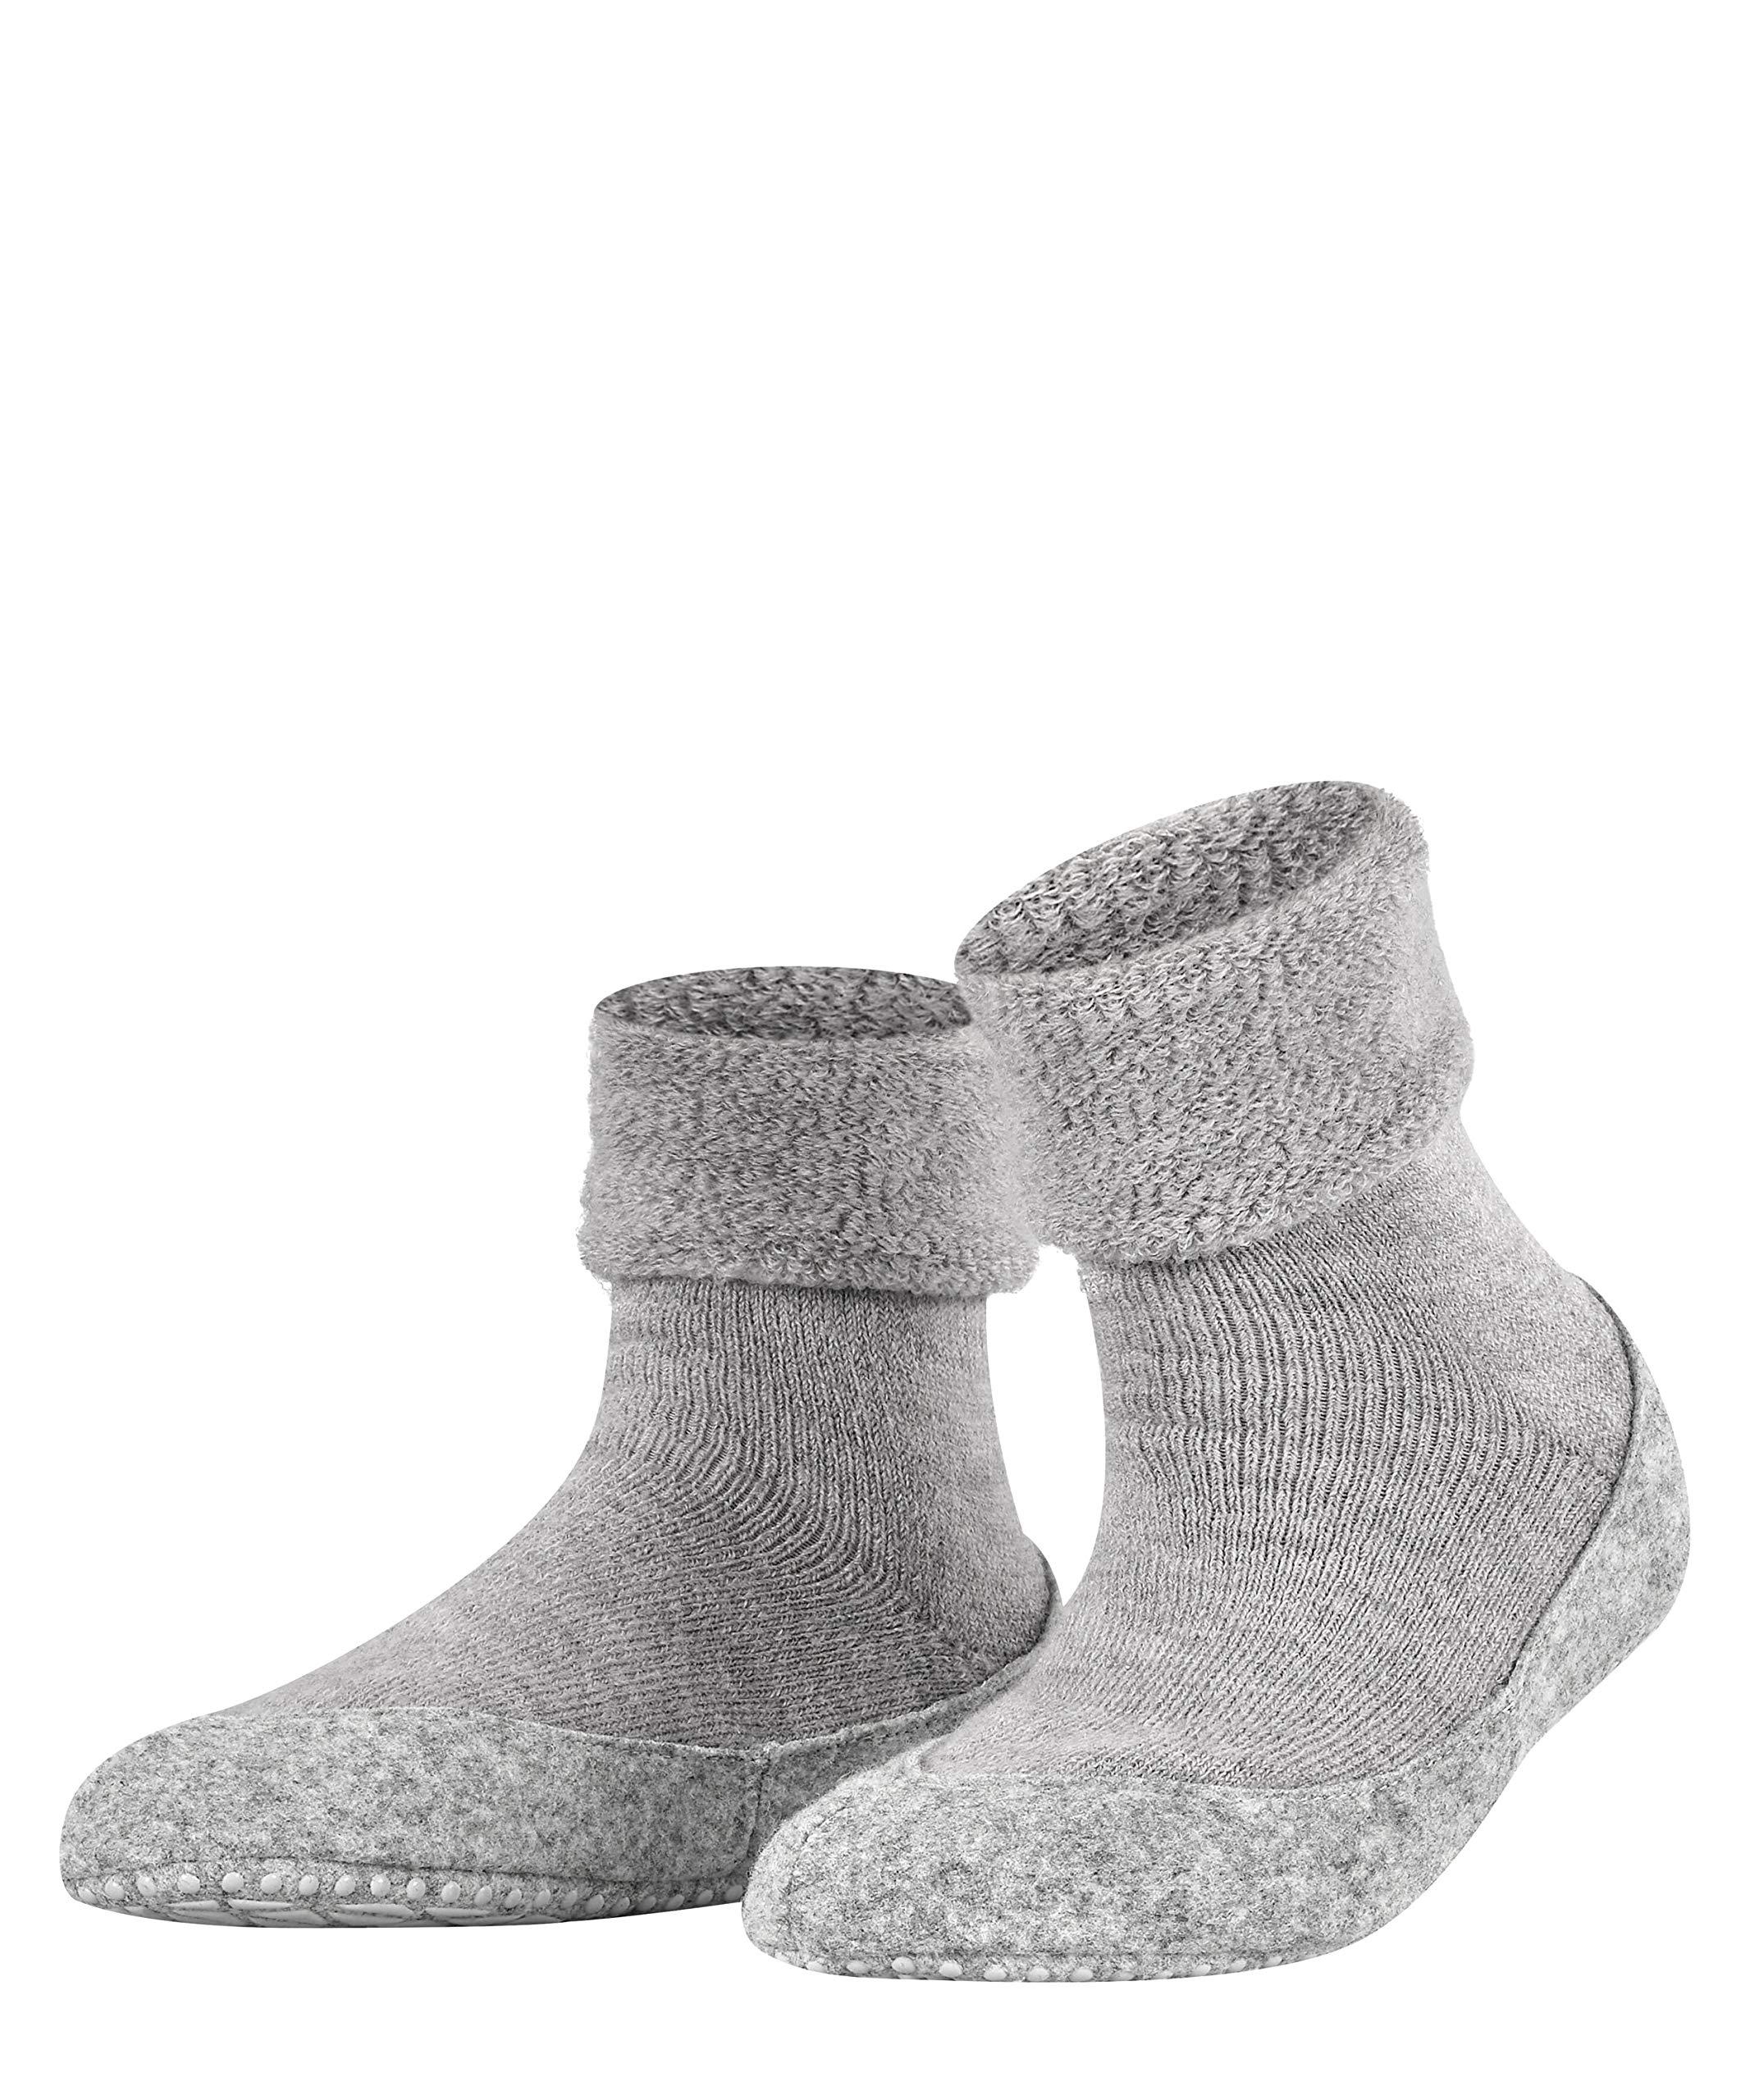 FALKE Casual Womens Cosyshoe Slipper Sock Merino Wool Grey Pink White 1 Pair